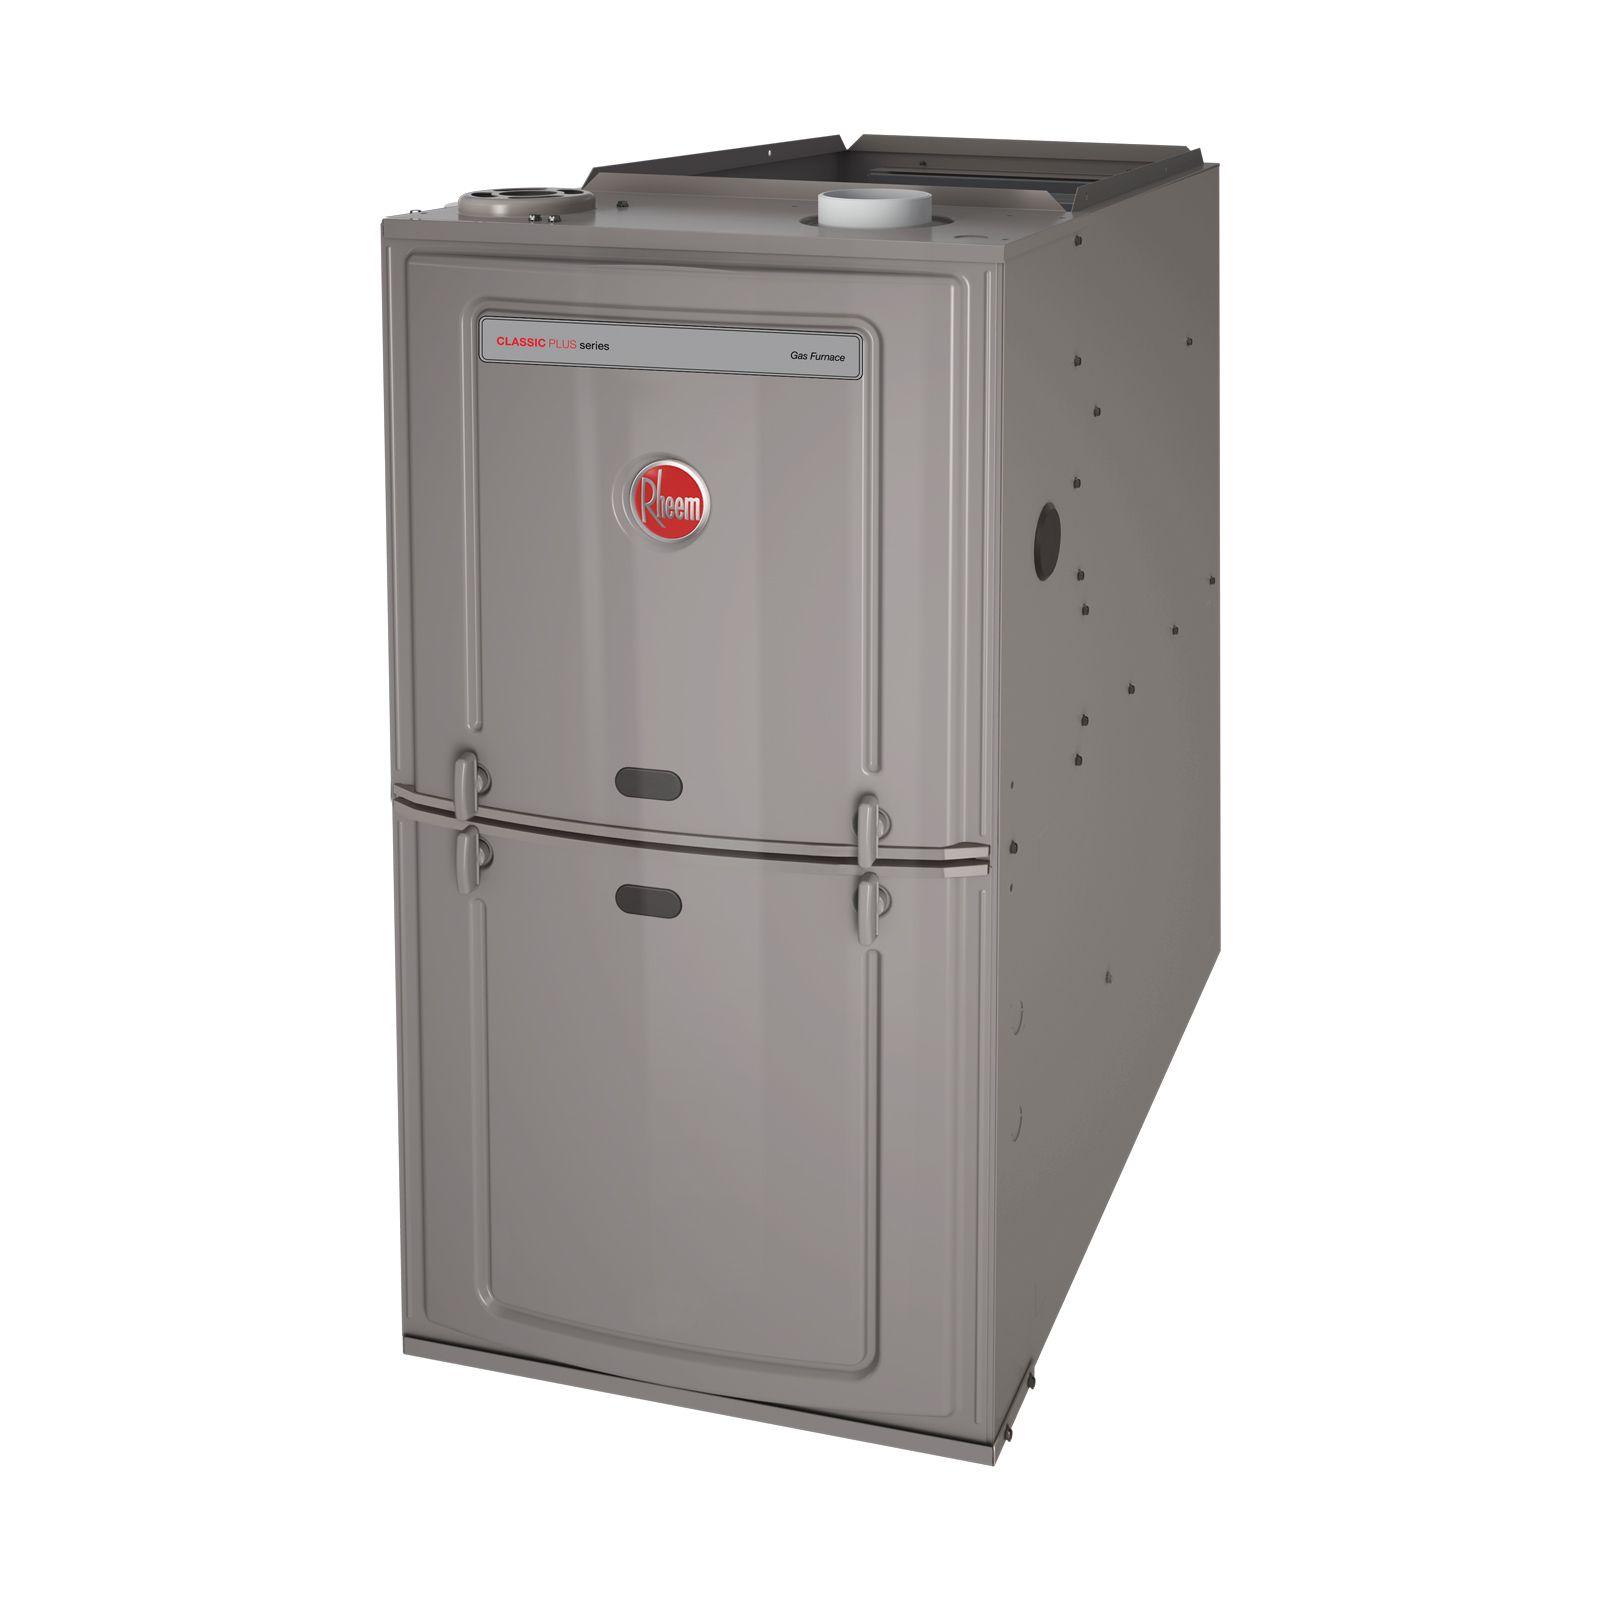 rheem r801ta075421msa classic plus 80% gas furnace single stage rheem r801ta075421msa classic plus 80% gas furnace single stage 75k btu upflow horizontal x 13 motor 2 1 2 to 4 ton